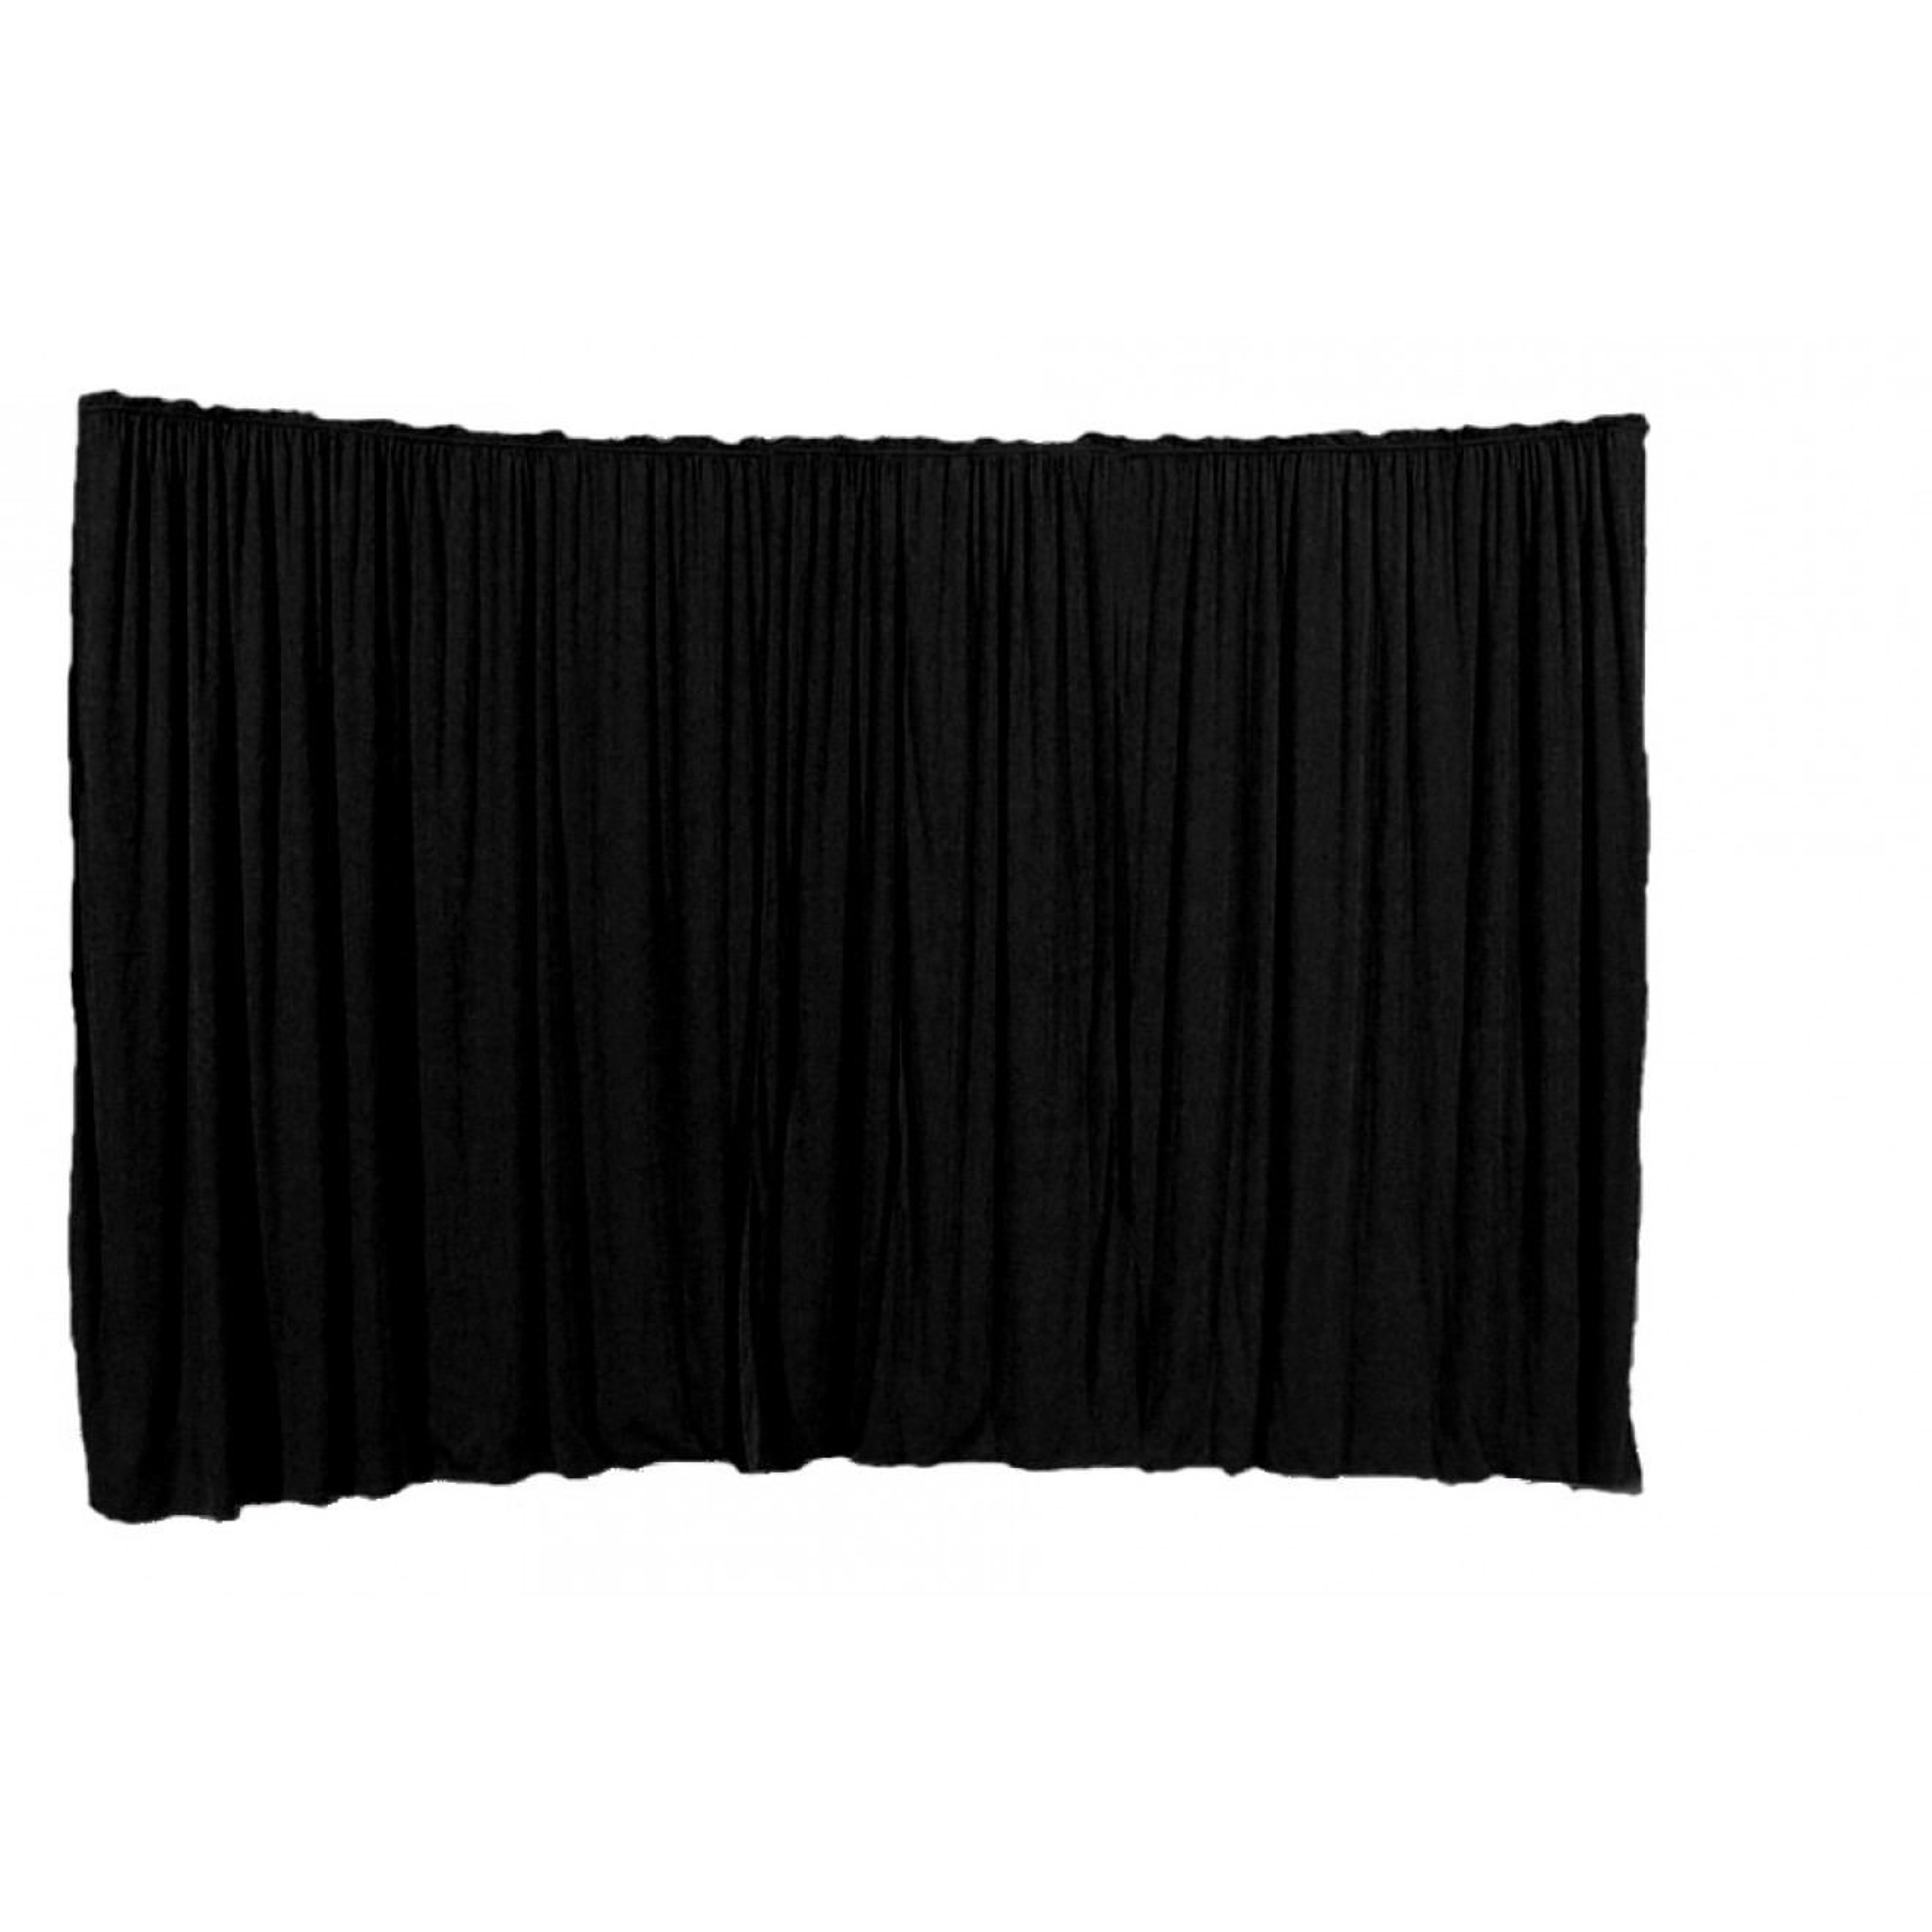 vorhang schwarz simple halloween trvorhang tr deko vorhang schwarz dekoration von kostenloser. Black Bedroom Furniture Sets. Home Design Ideas